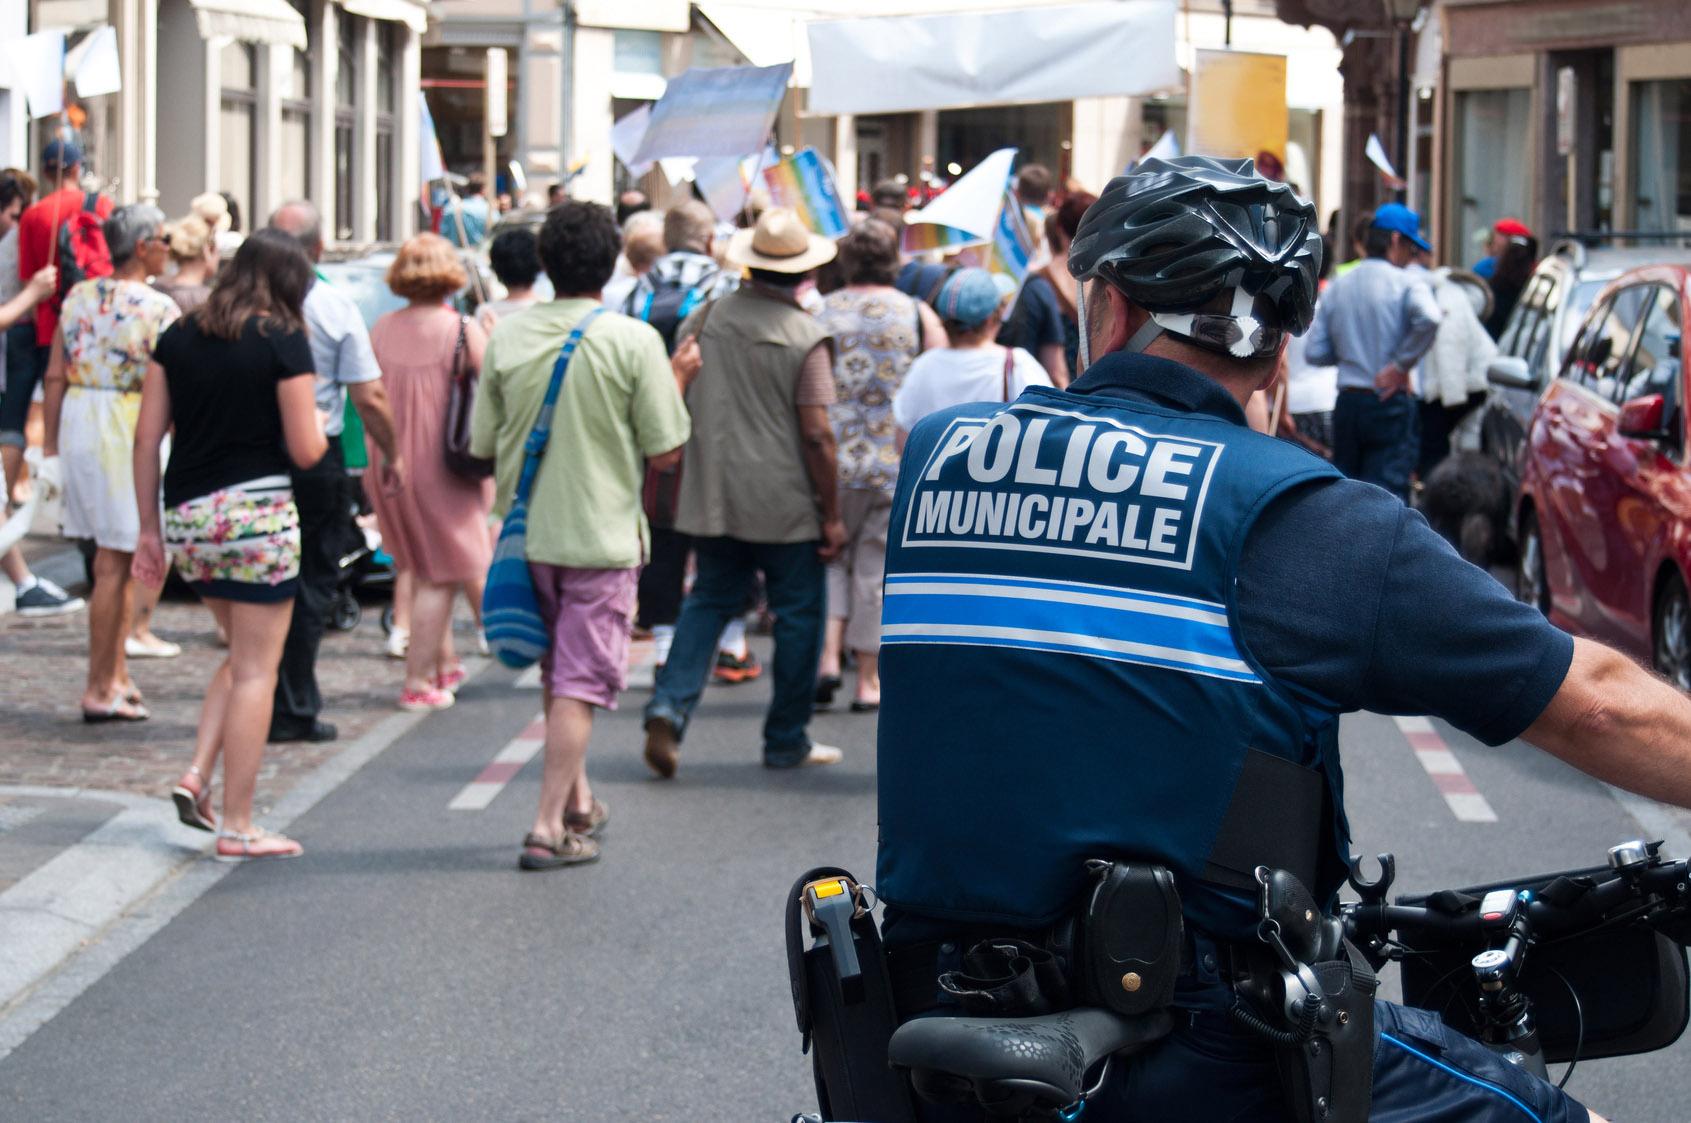 Policier municipal polici re municipale m tier tudes - Grille indiciaire salaire police municipale ...